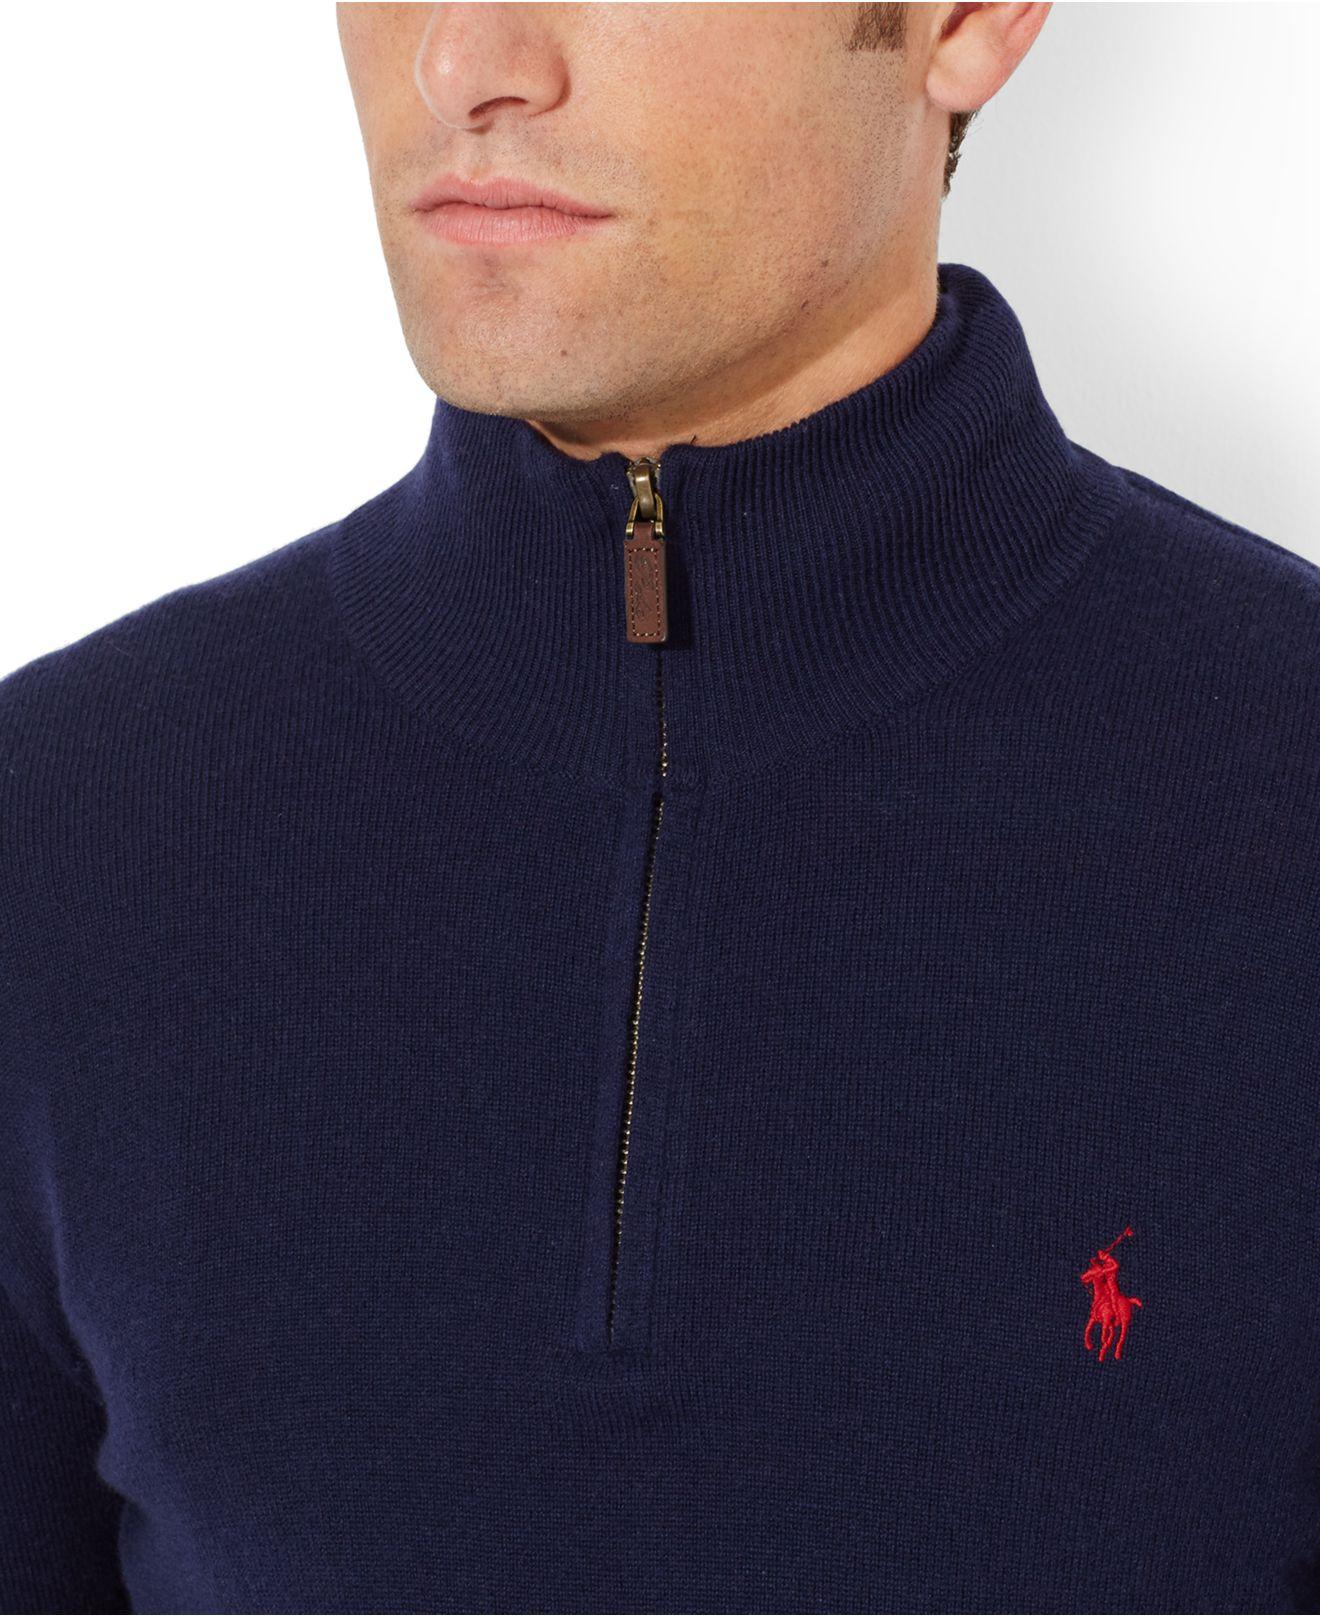 8b61bbeef Lyst - Polo Ralph Lauren Merino Wool Half-Zip Sweater in Blue for Men